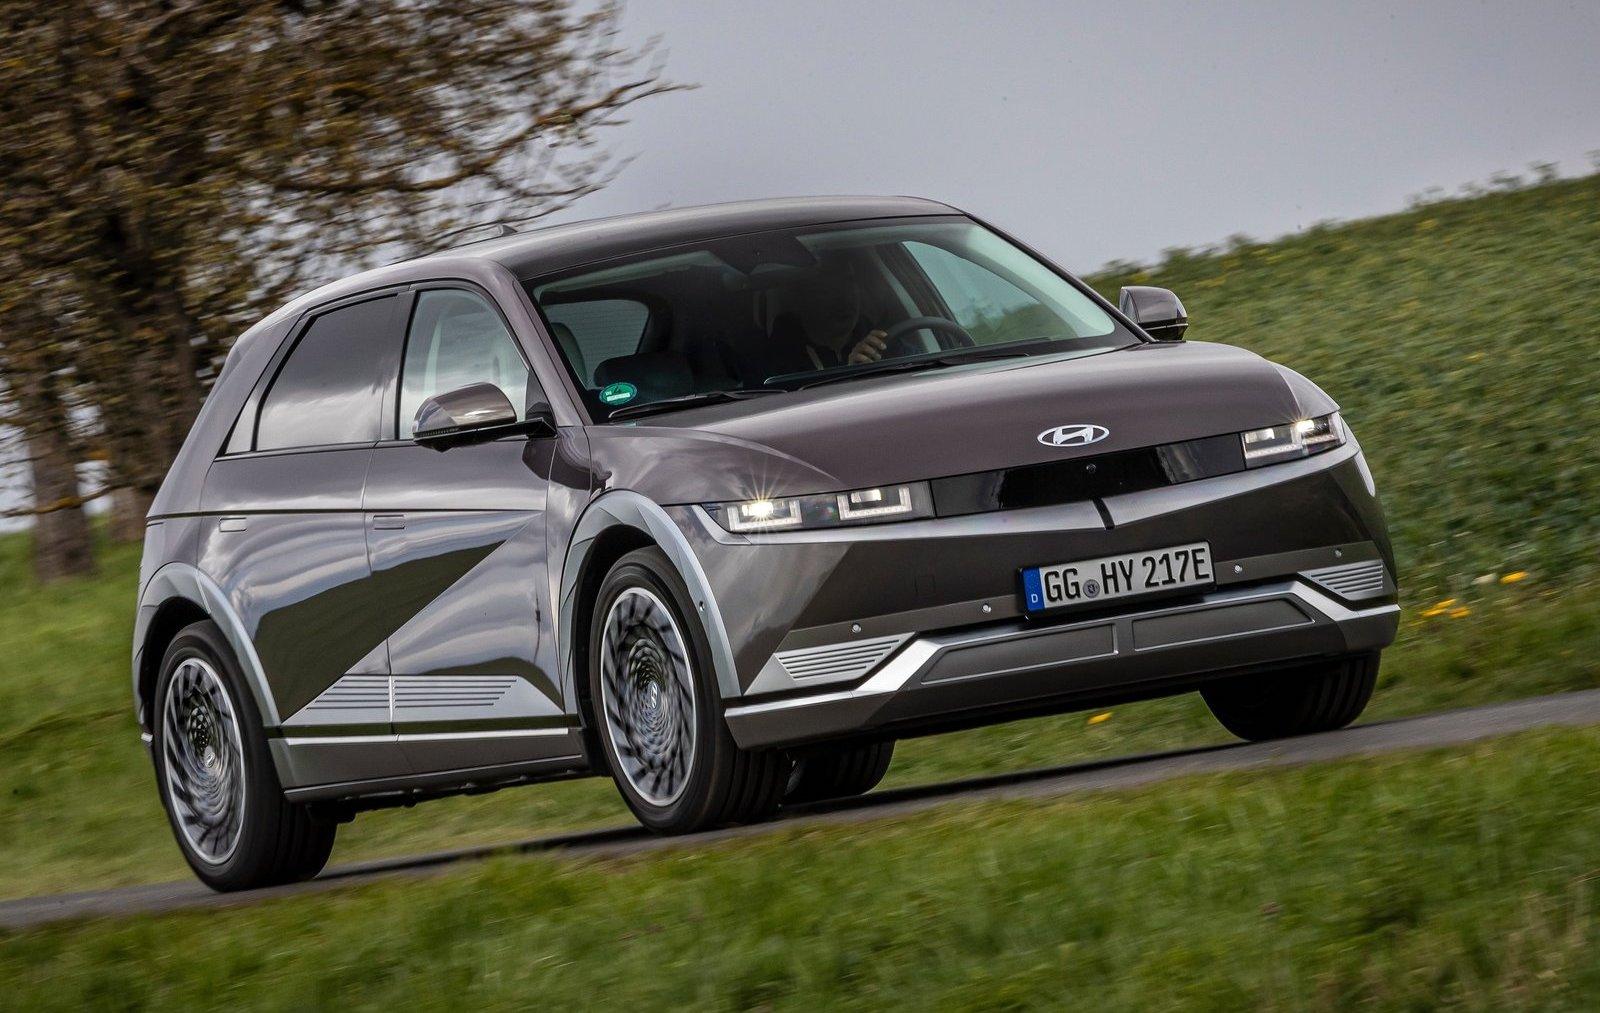 Hyundai confirms electric N model coming, based on IONIQ 5? (video)